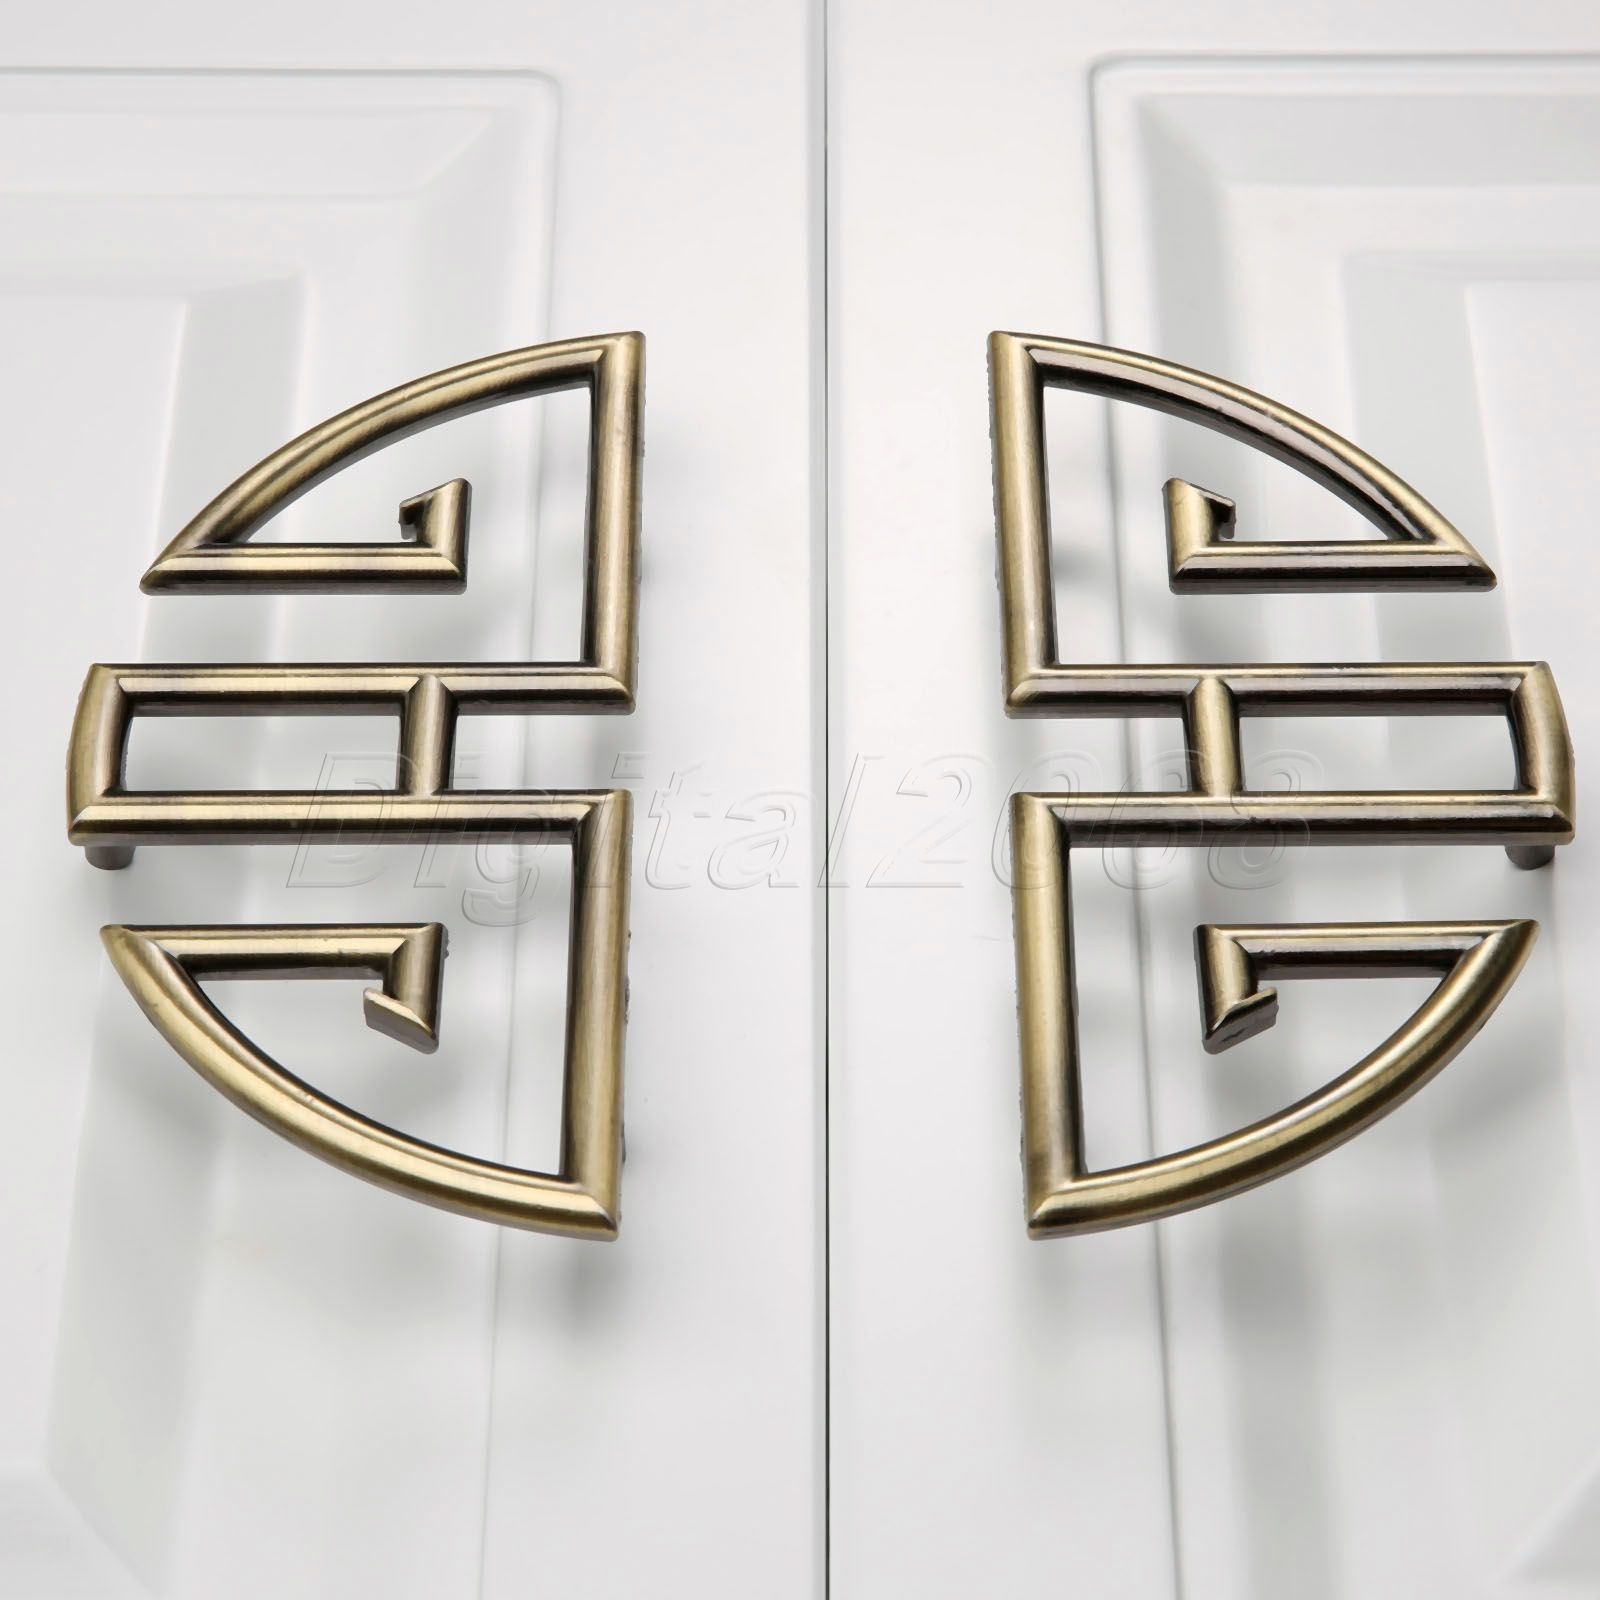 online get cheap kitchen door furniture aliexpress com alibaba 1 pair 96mm vintage furniture cupboard wardrobe handles and knobs antique bronze alloy kitchen cabinet door